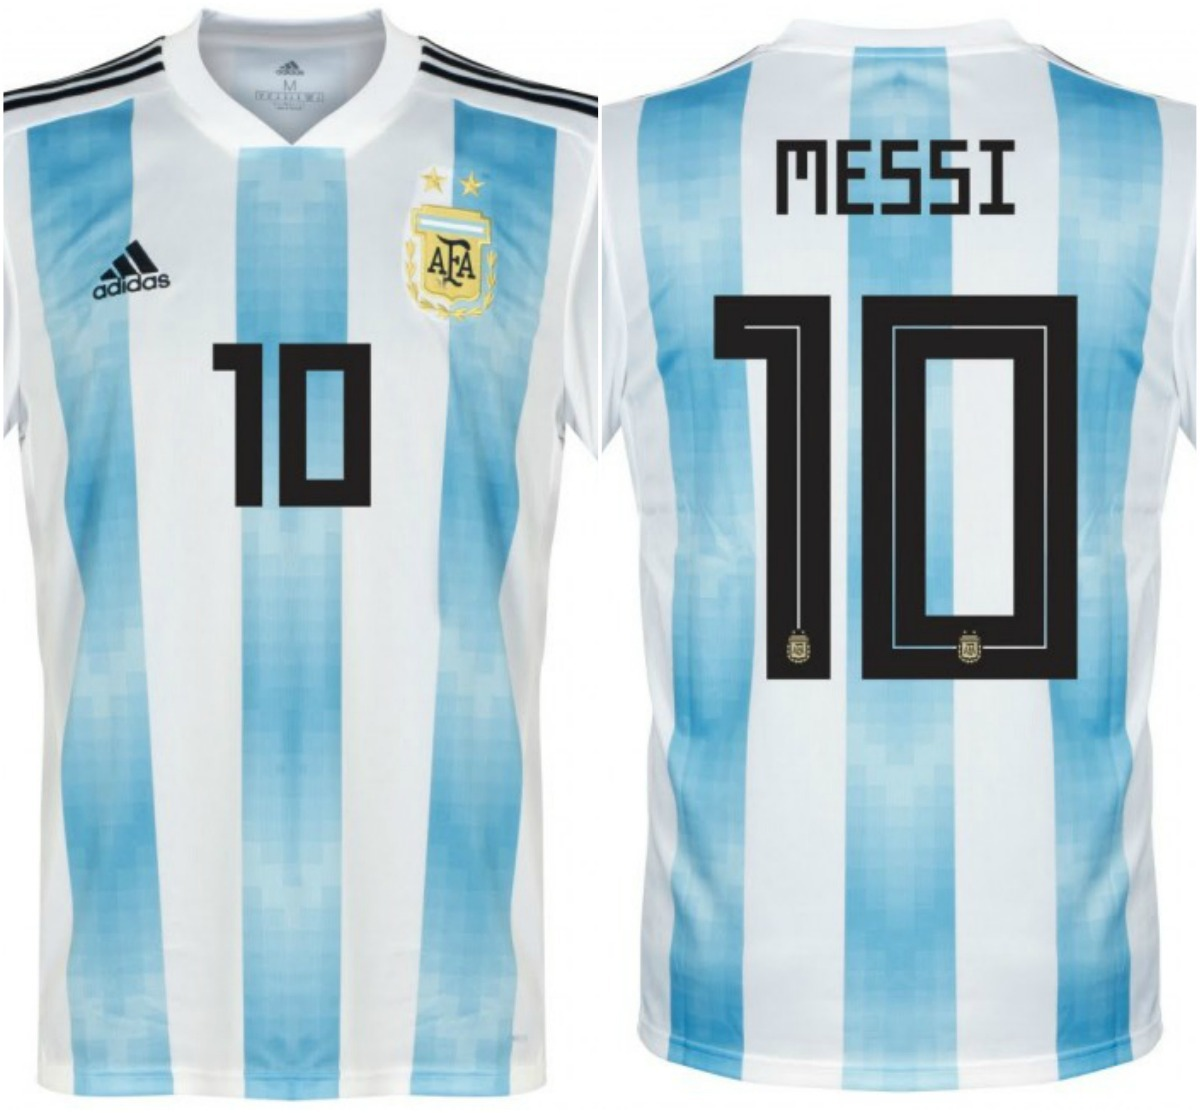 Camiseta Argentina Oficial Rusia 2018 adidas Climalite Messi ... 42a1d7f958a3b